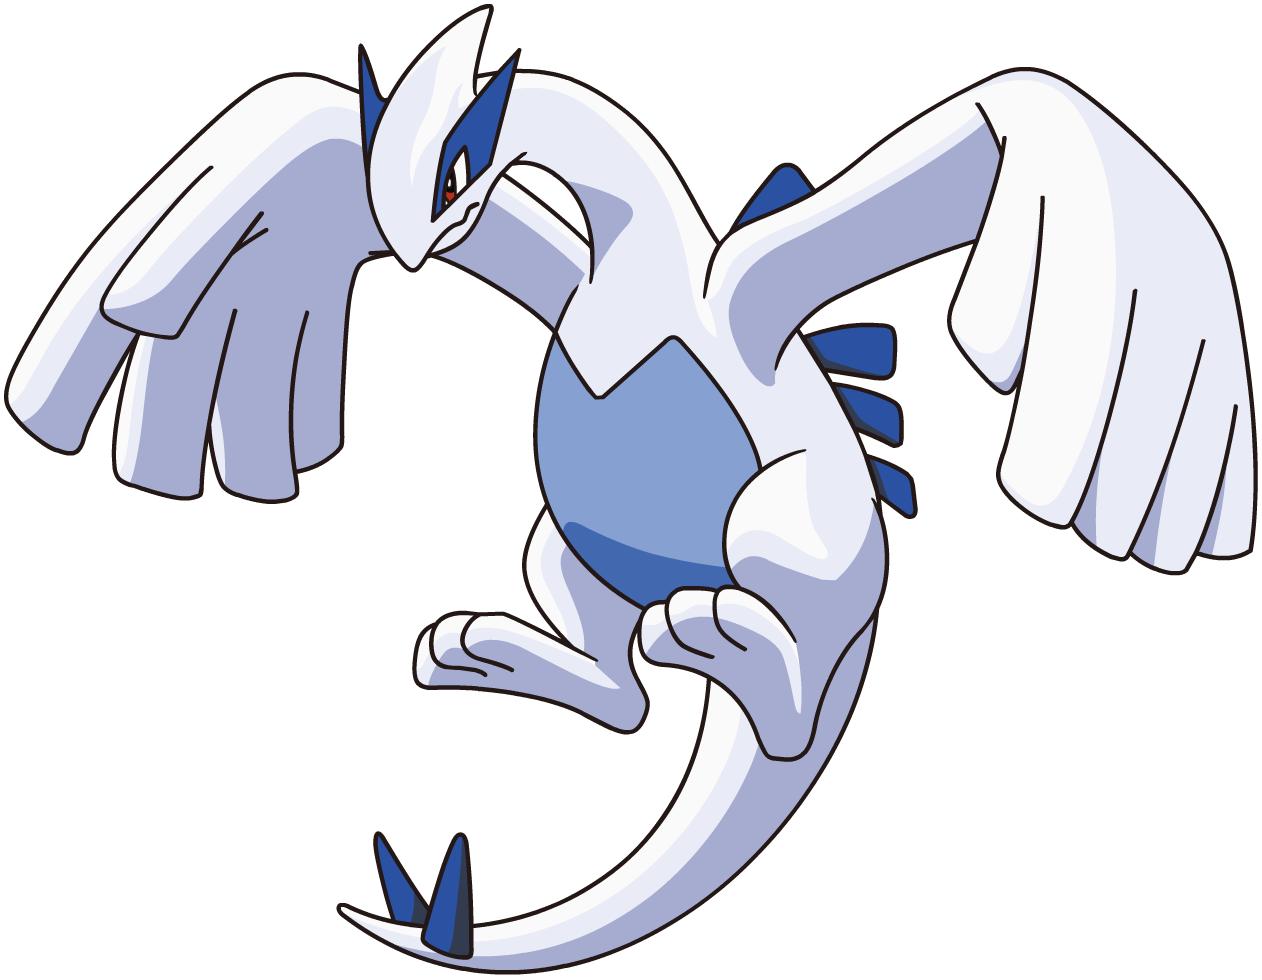 Lugia, one of the easiest Pokemon to draw